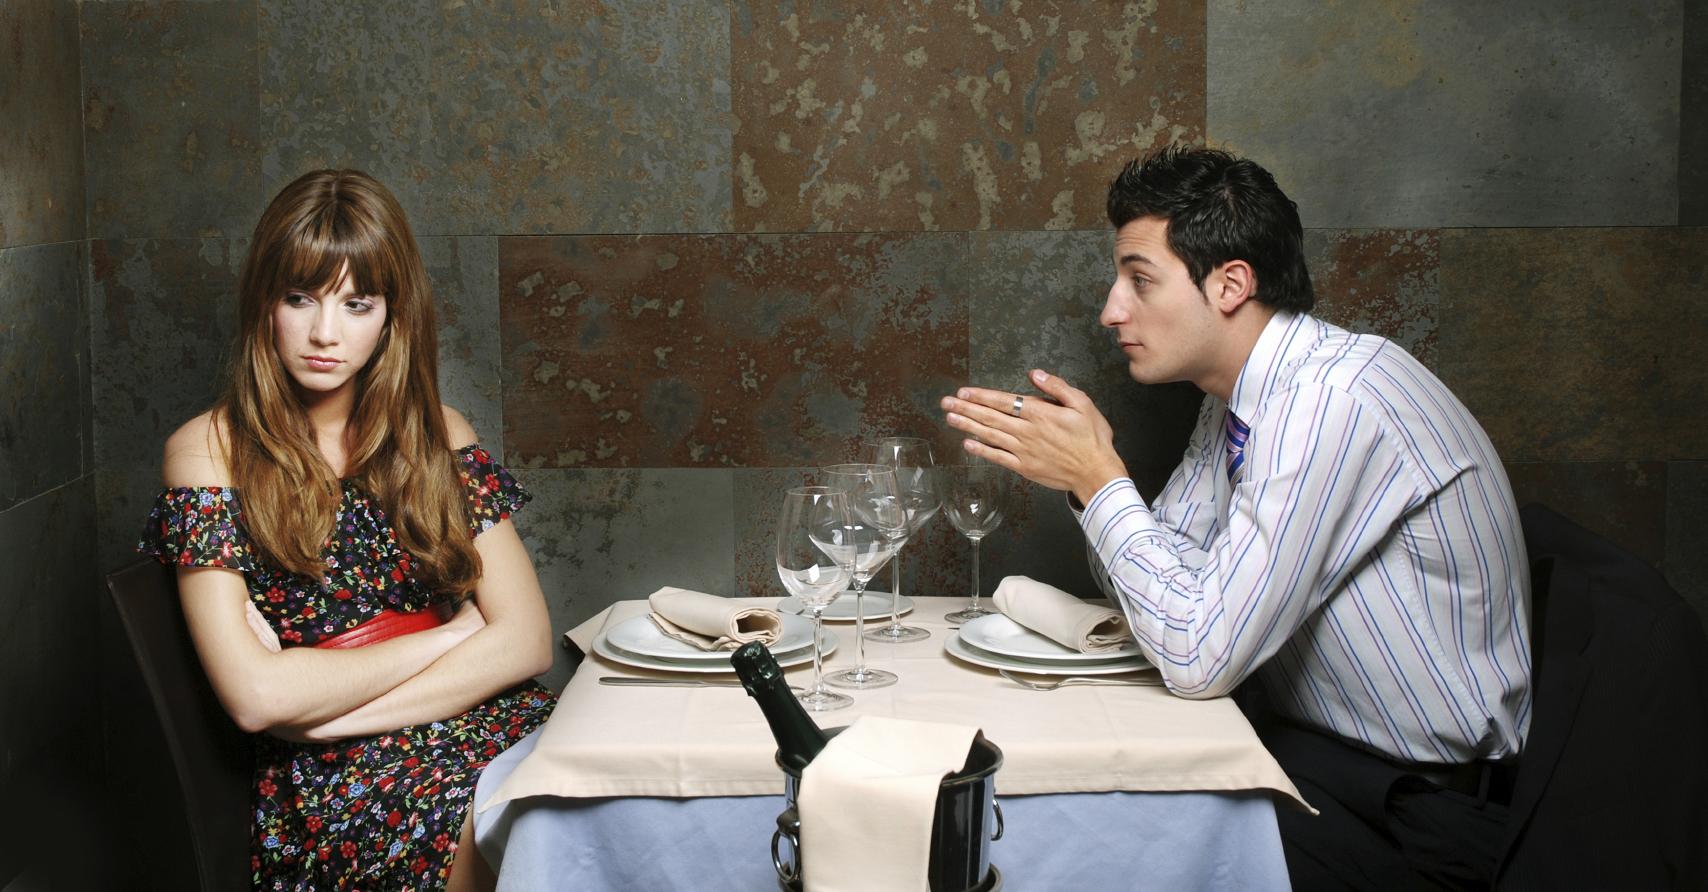 Sdn dating fest